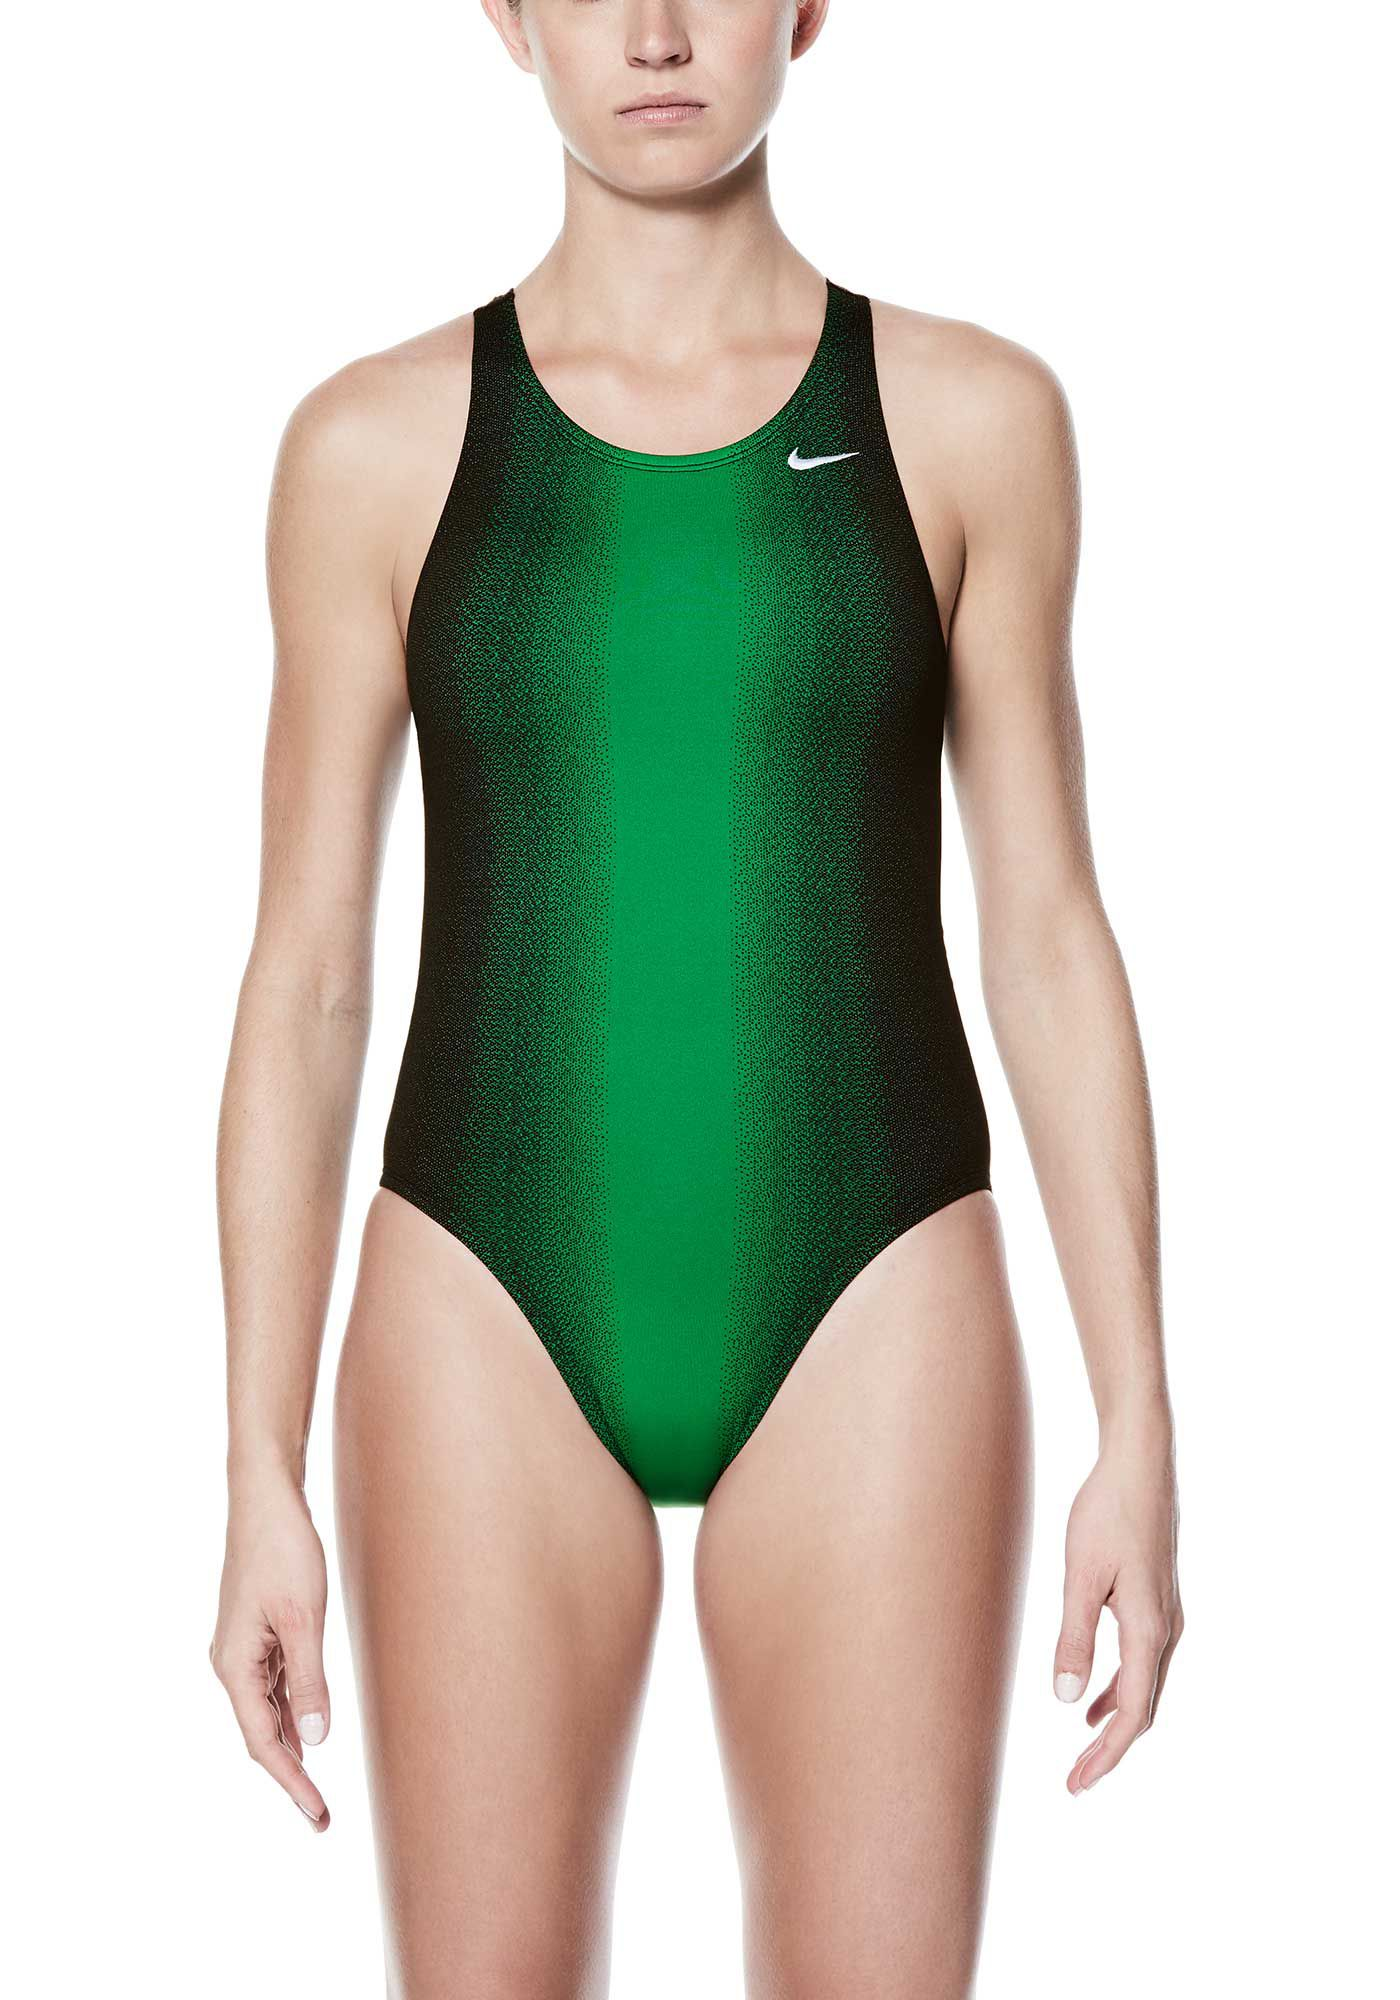 Nike Women's Fade Sting Fast Back Swimsuit